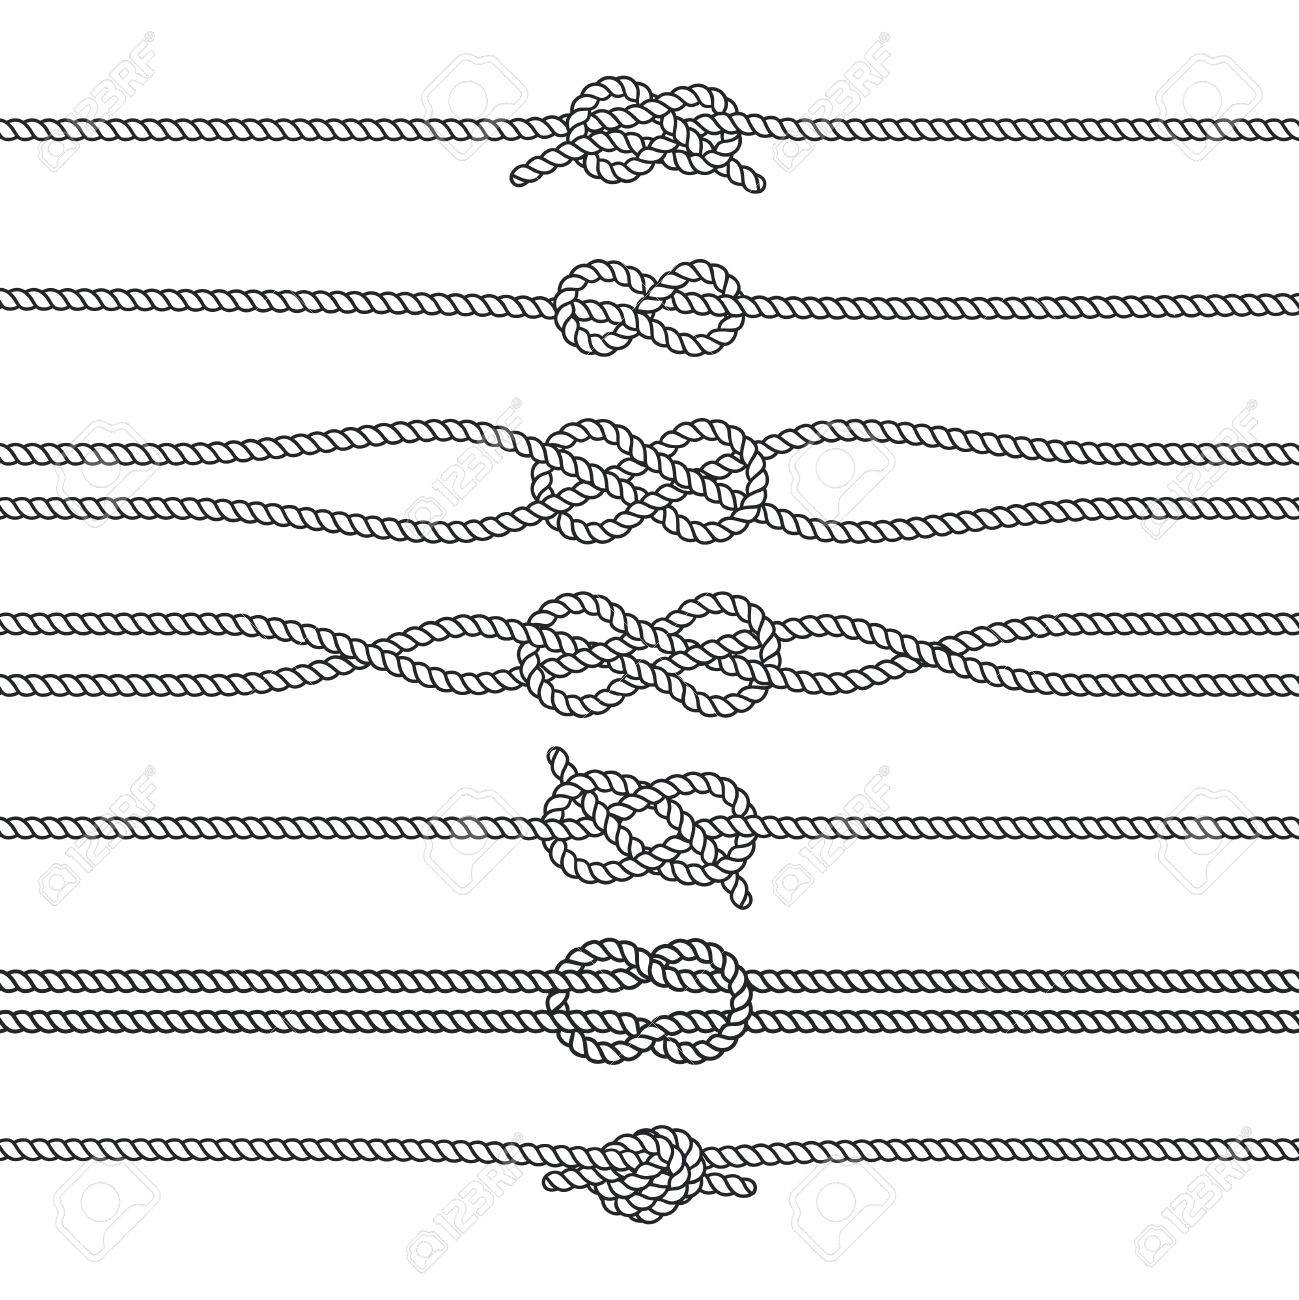 Sailing knots horizontal borders or deviders. Vector marine decorations.